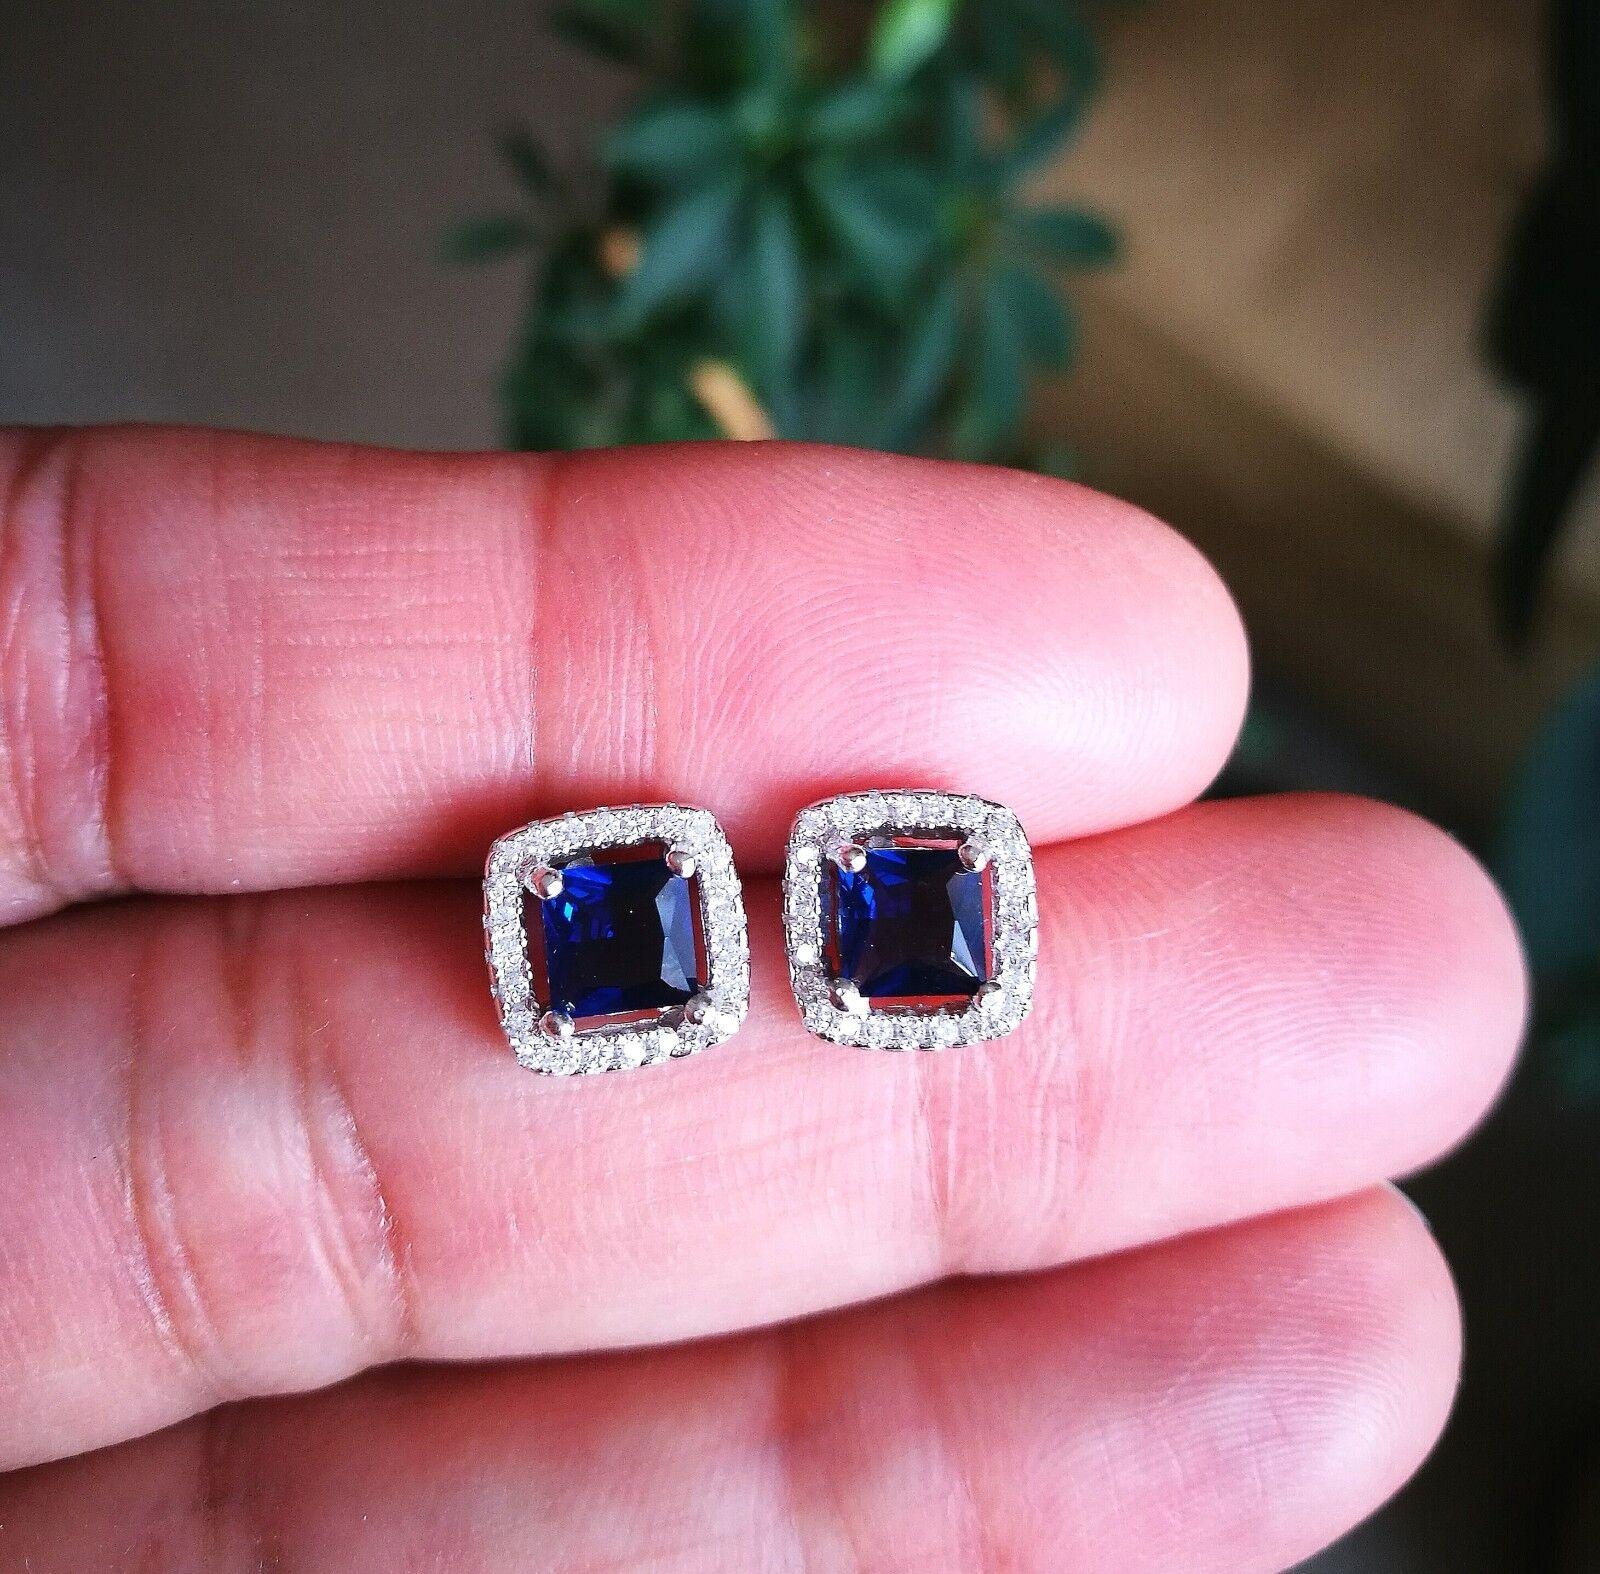 2 Ct Diamond Halo Stud Earrings with Blue Sapphire Women's Studs 14K White Gold 3